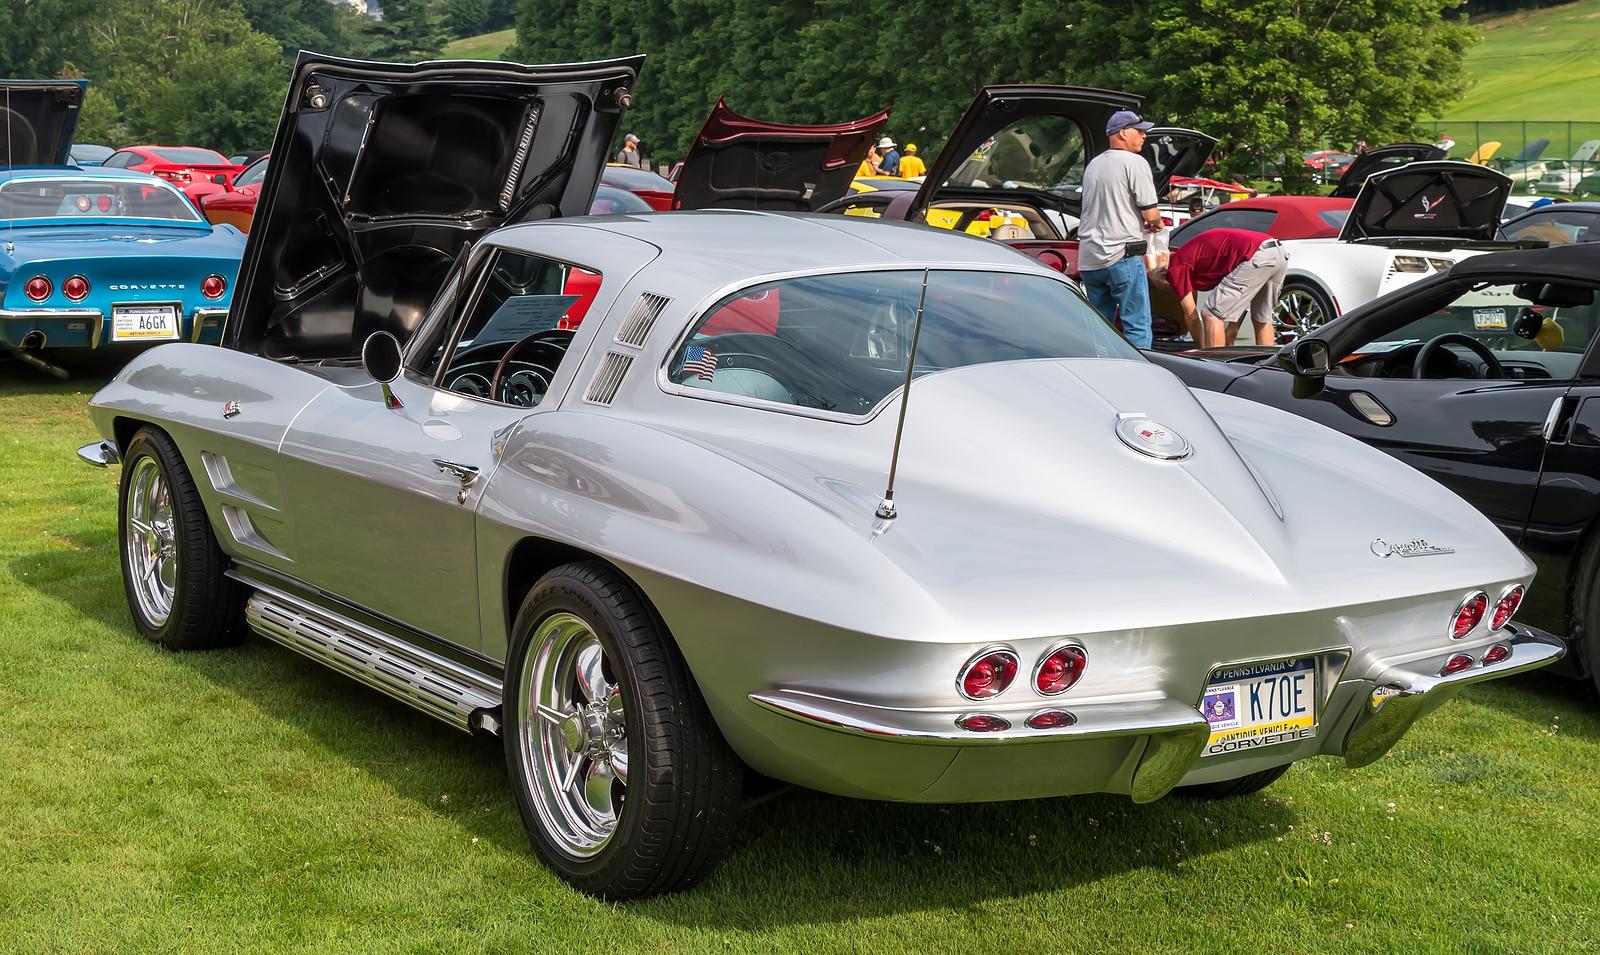 A 1964 Chevrolet Corvette on display